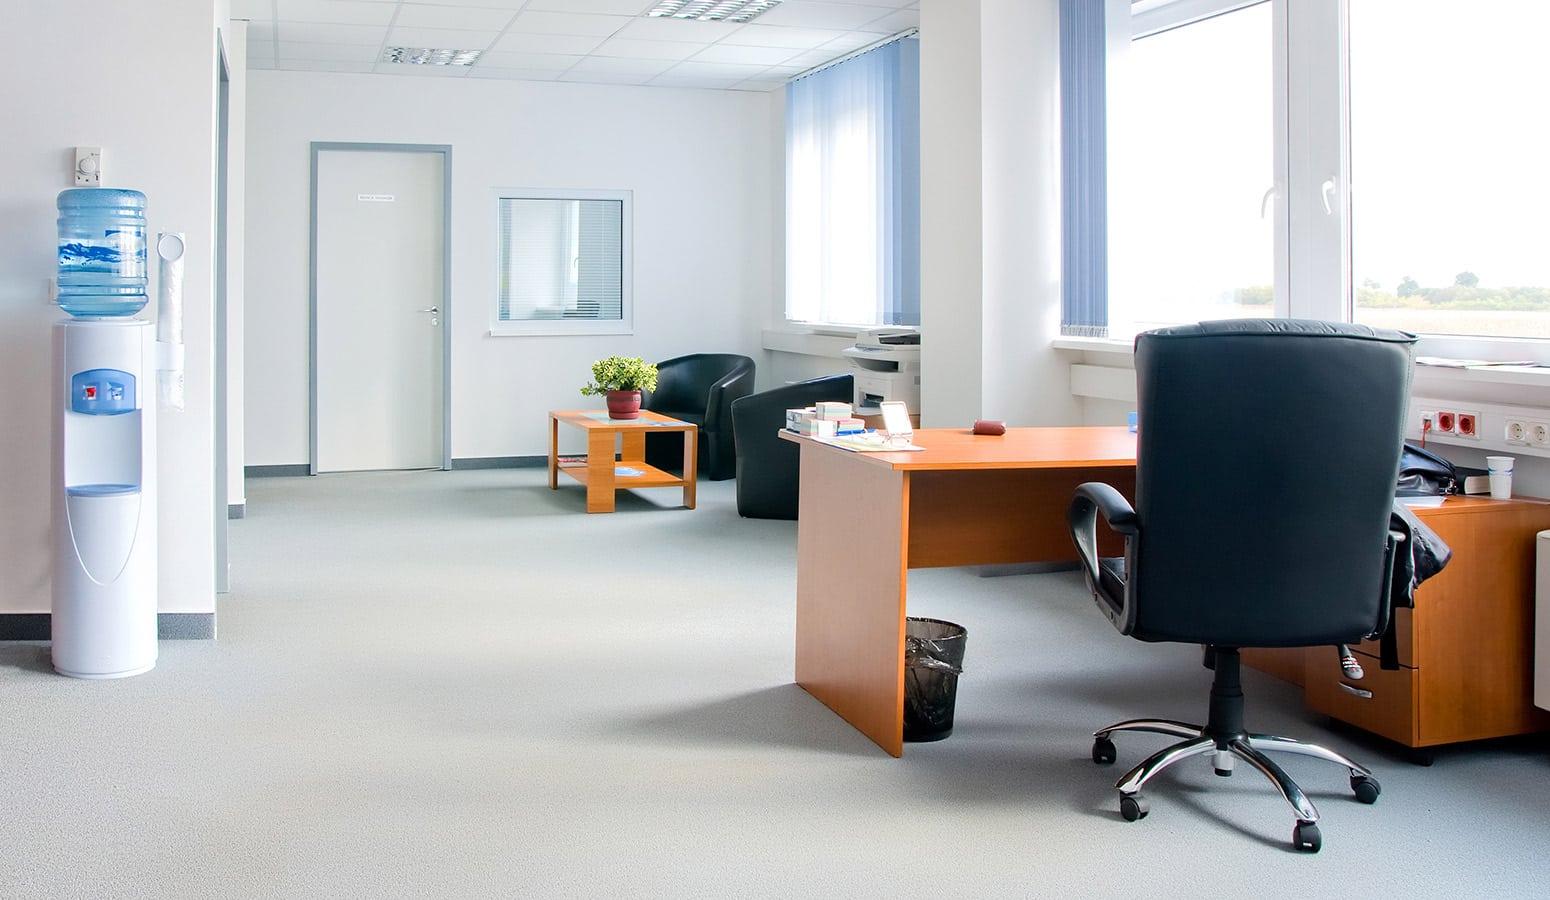 ordinary office